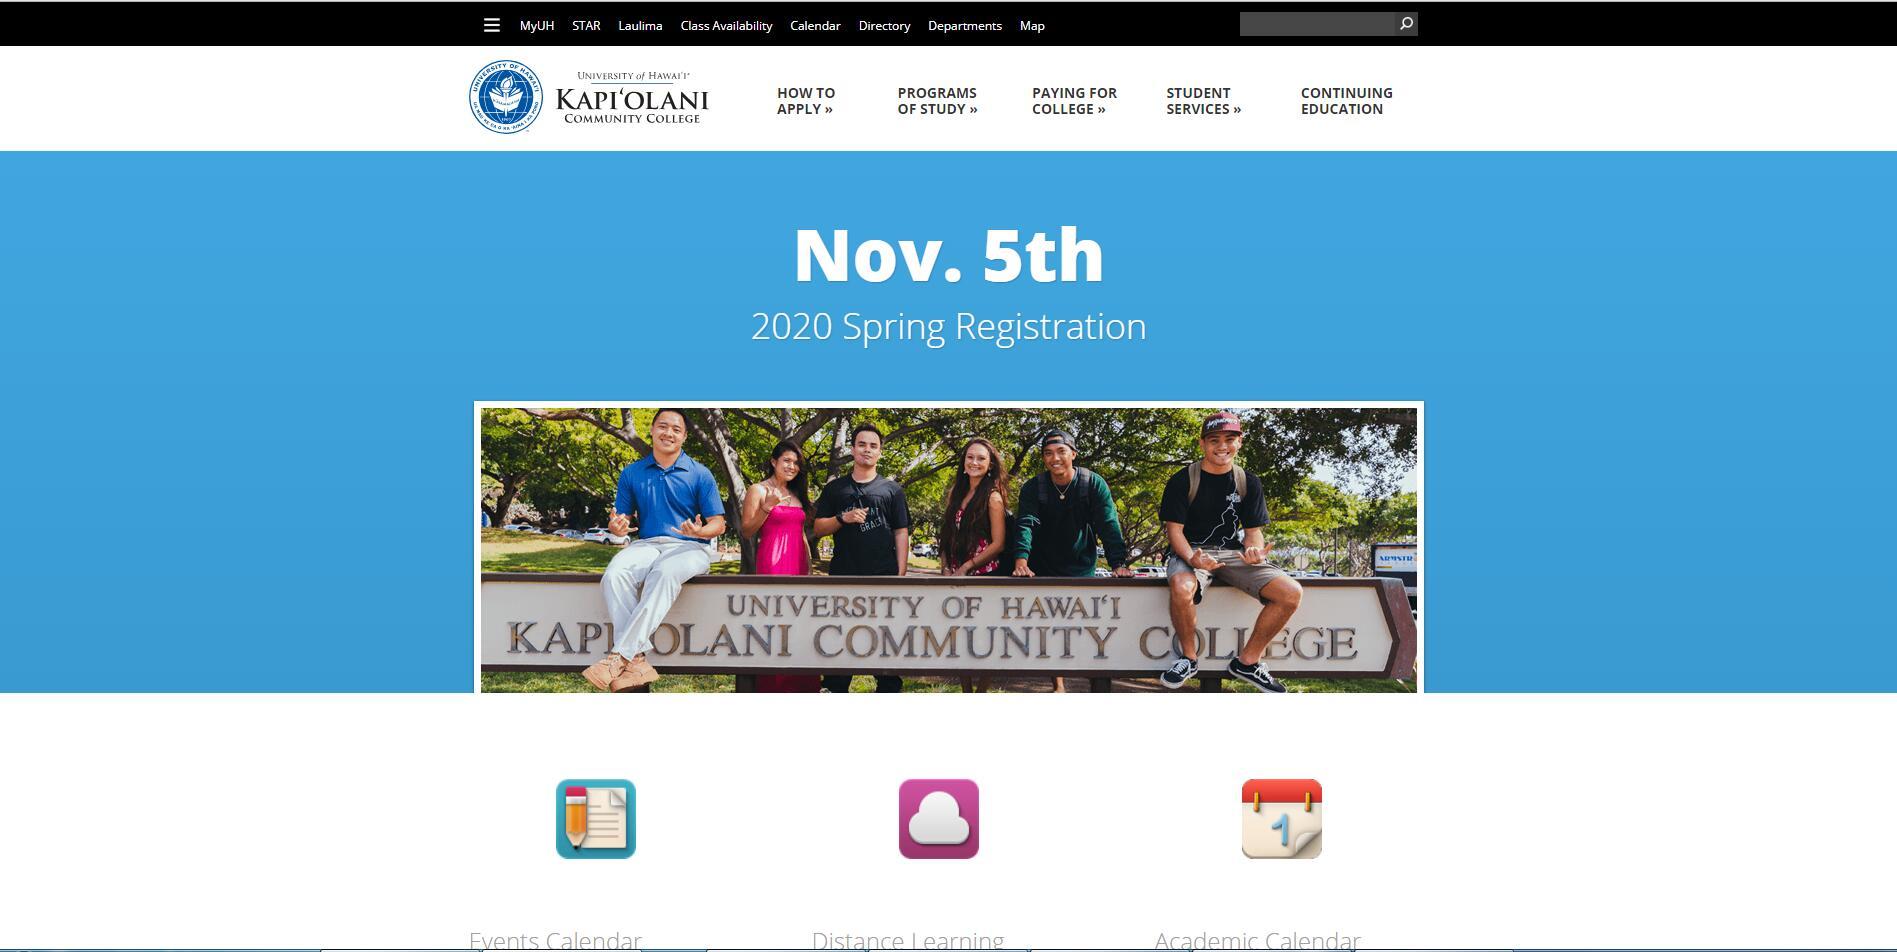 Kapiolani Community College